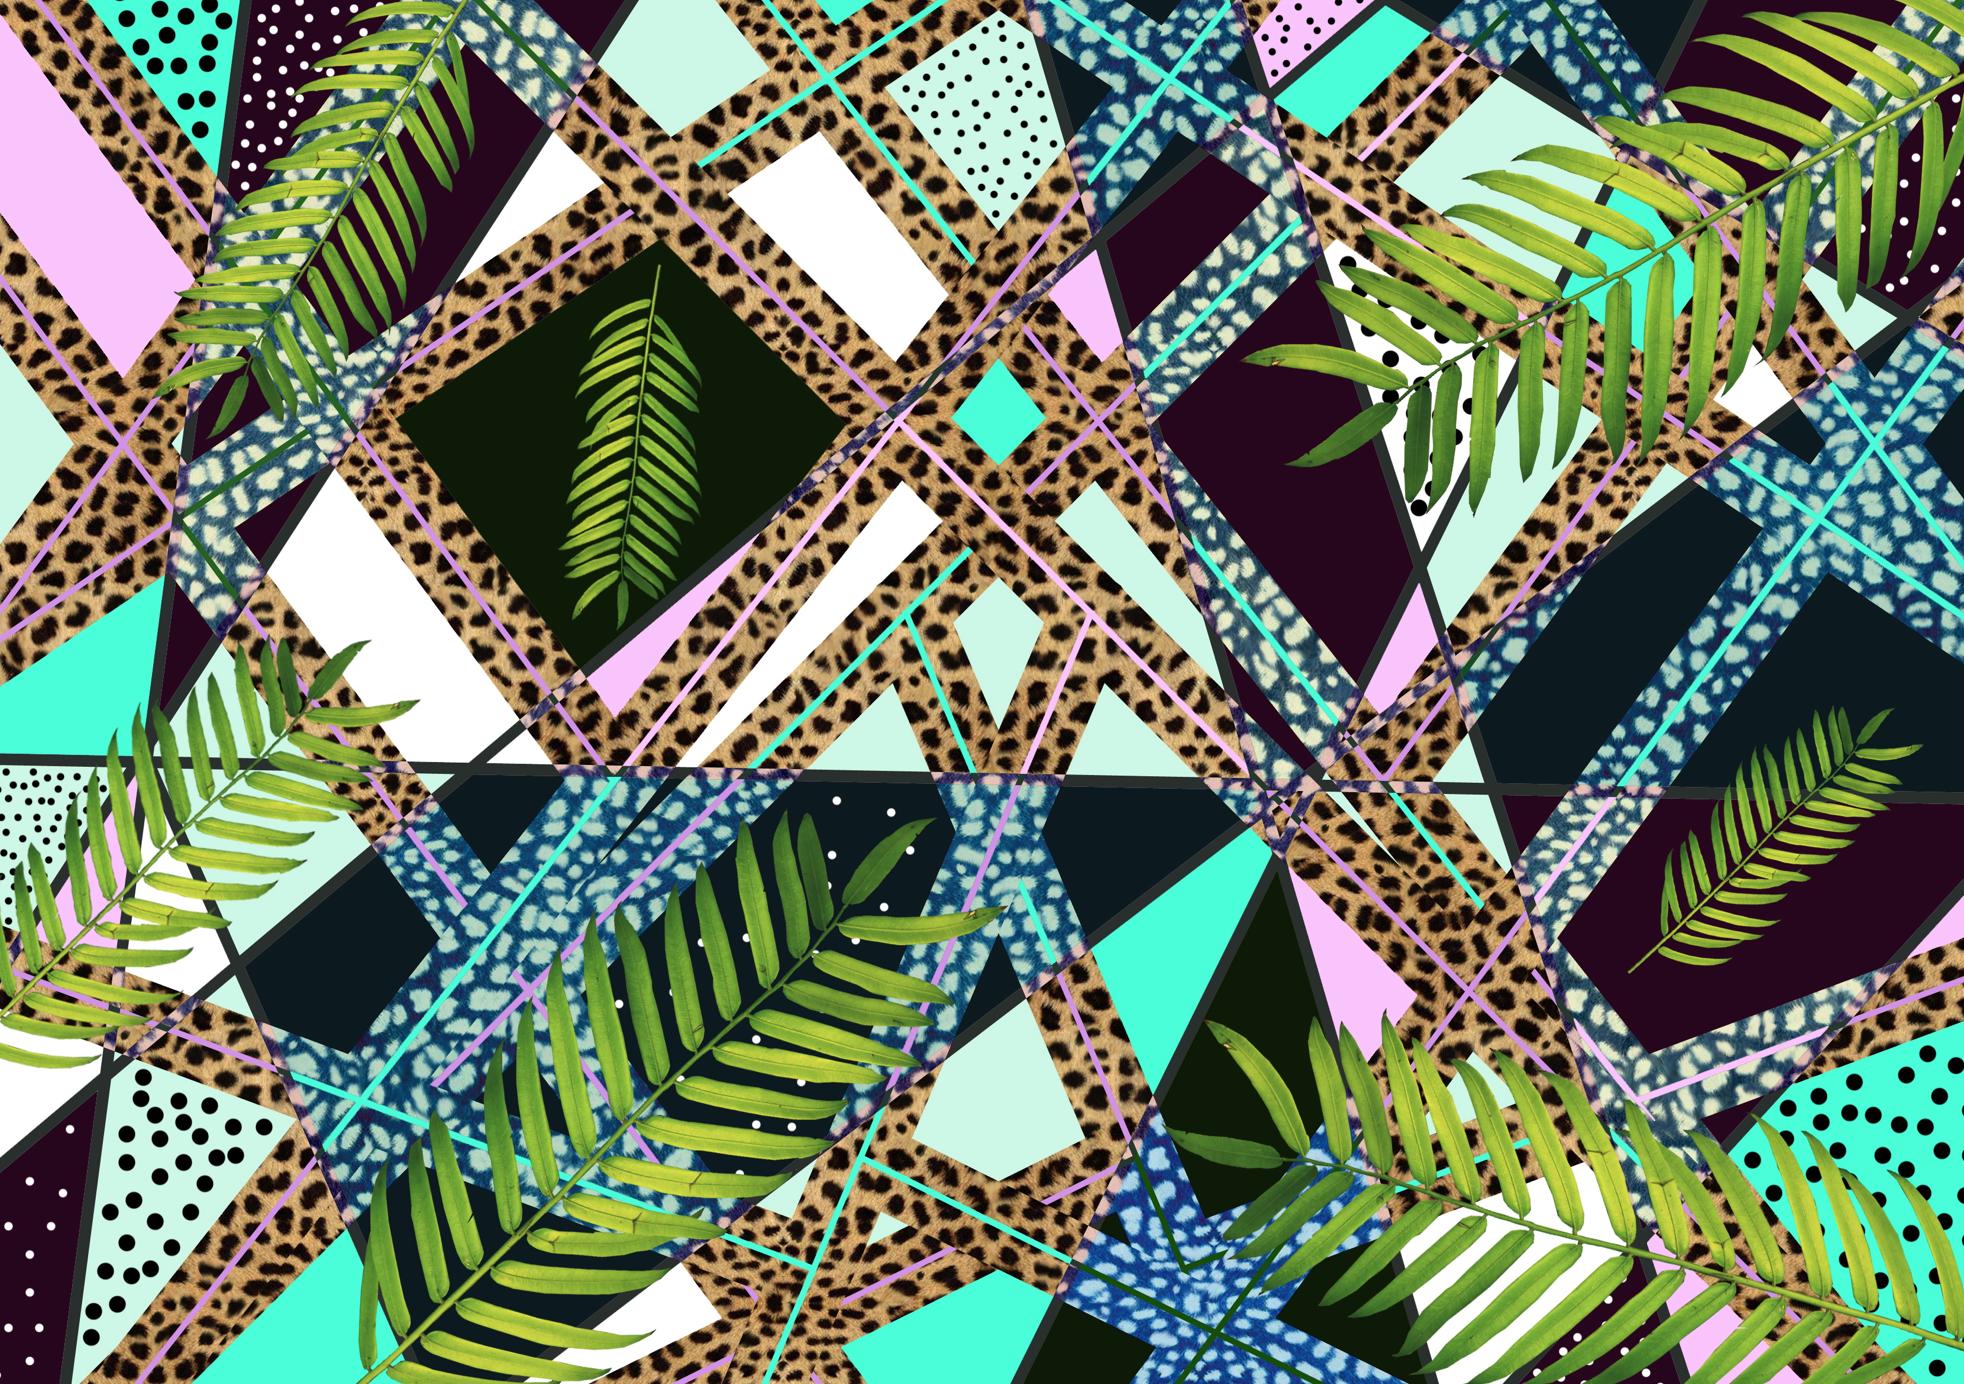 aiwaiwa society6 palm summer paradise jungle print animal print 1964x1384